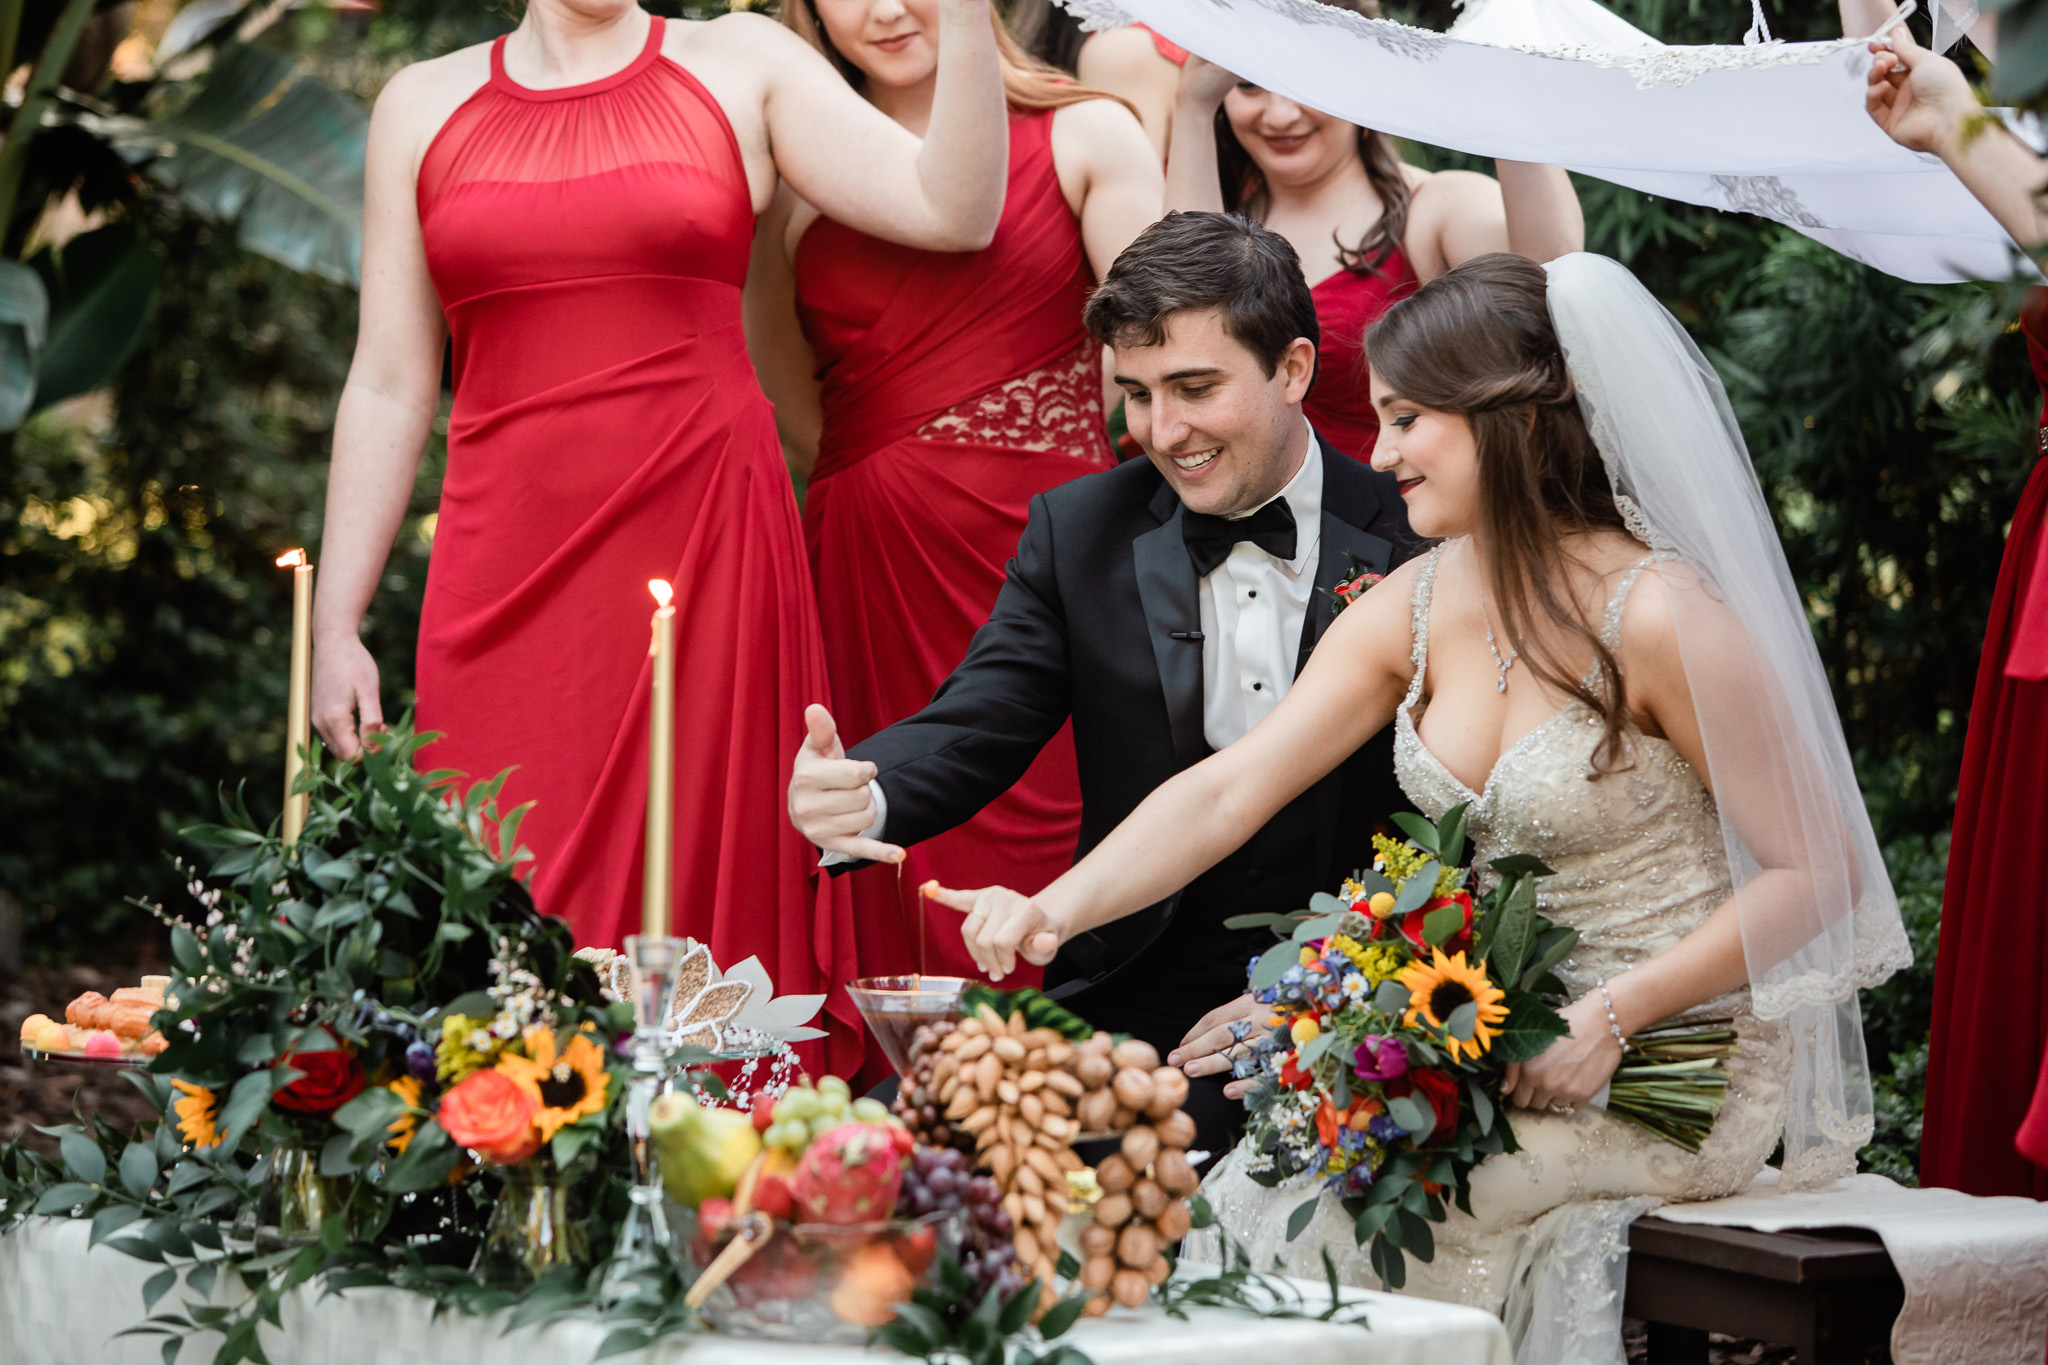 TAMPA_WEDDING_PHOTOGRAPHER_MPMZ_TJL47570_0107.jpg